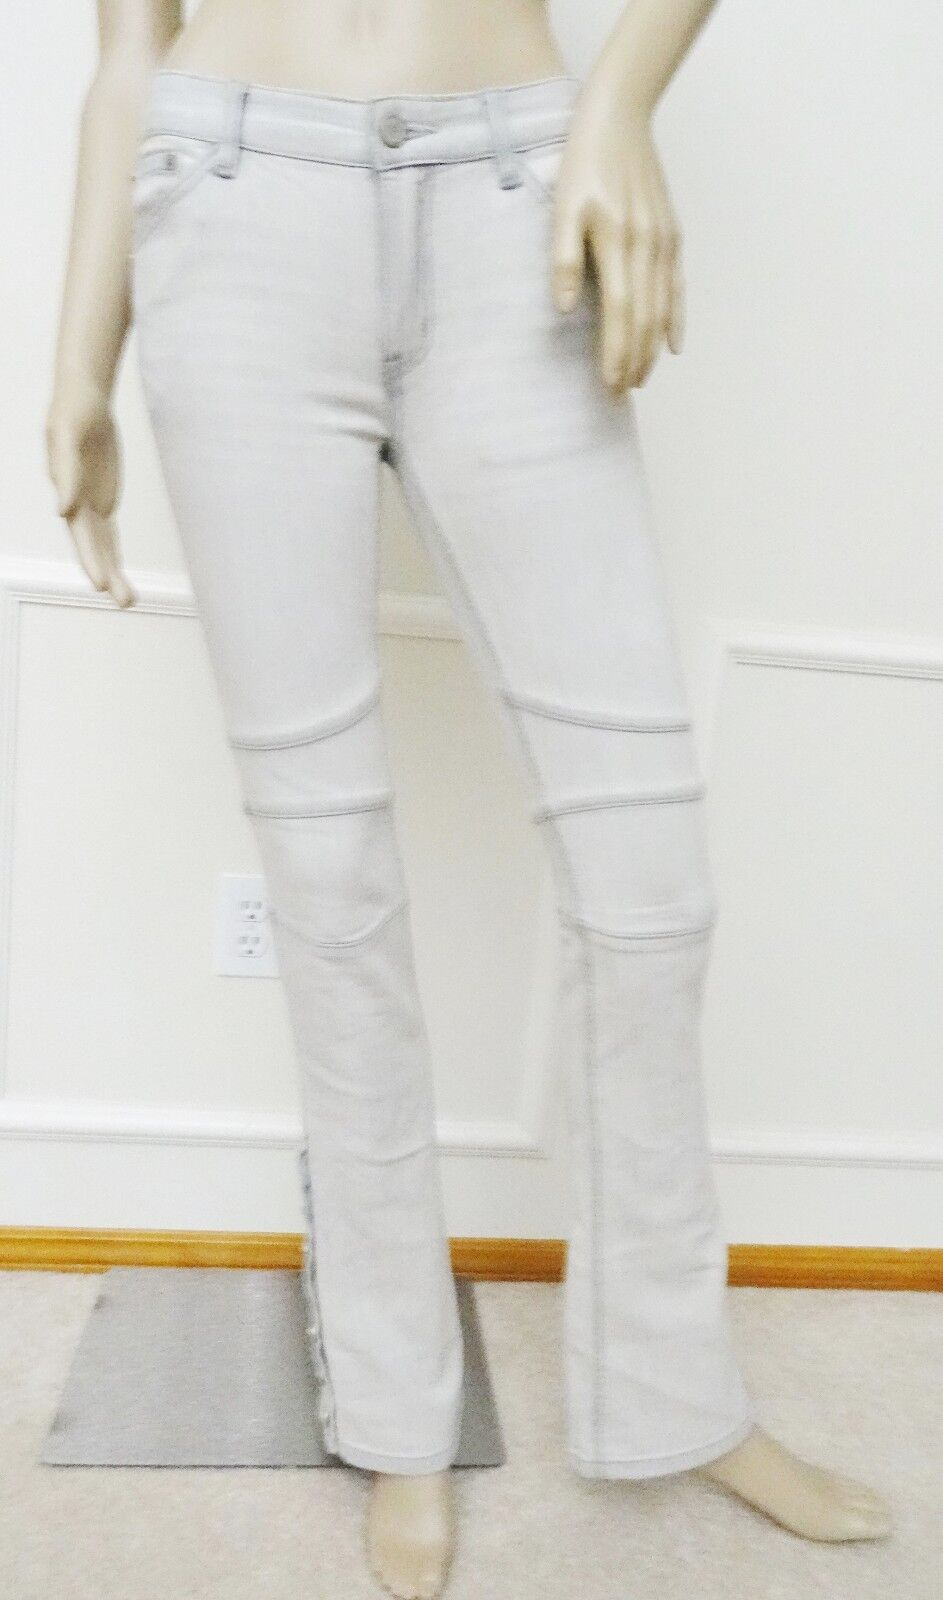 Nwt Free People Flare Low Rise Stretch Knee Seams Denim Jeans Sz 24 00 Khaki